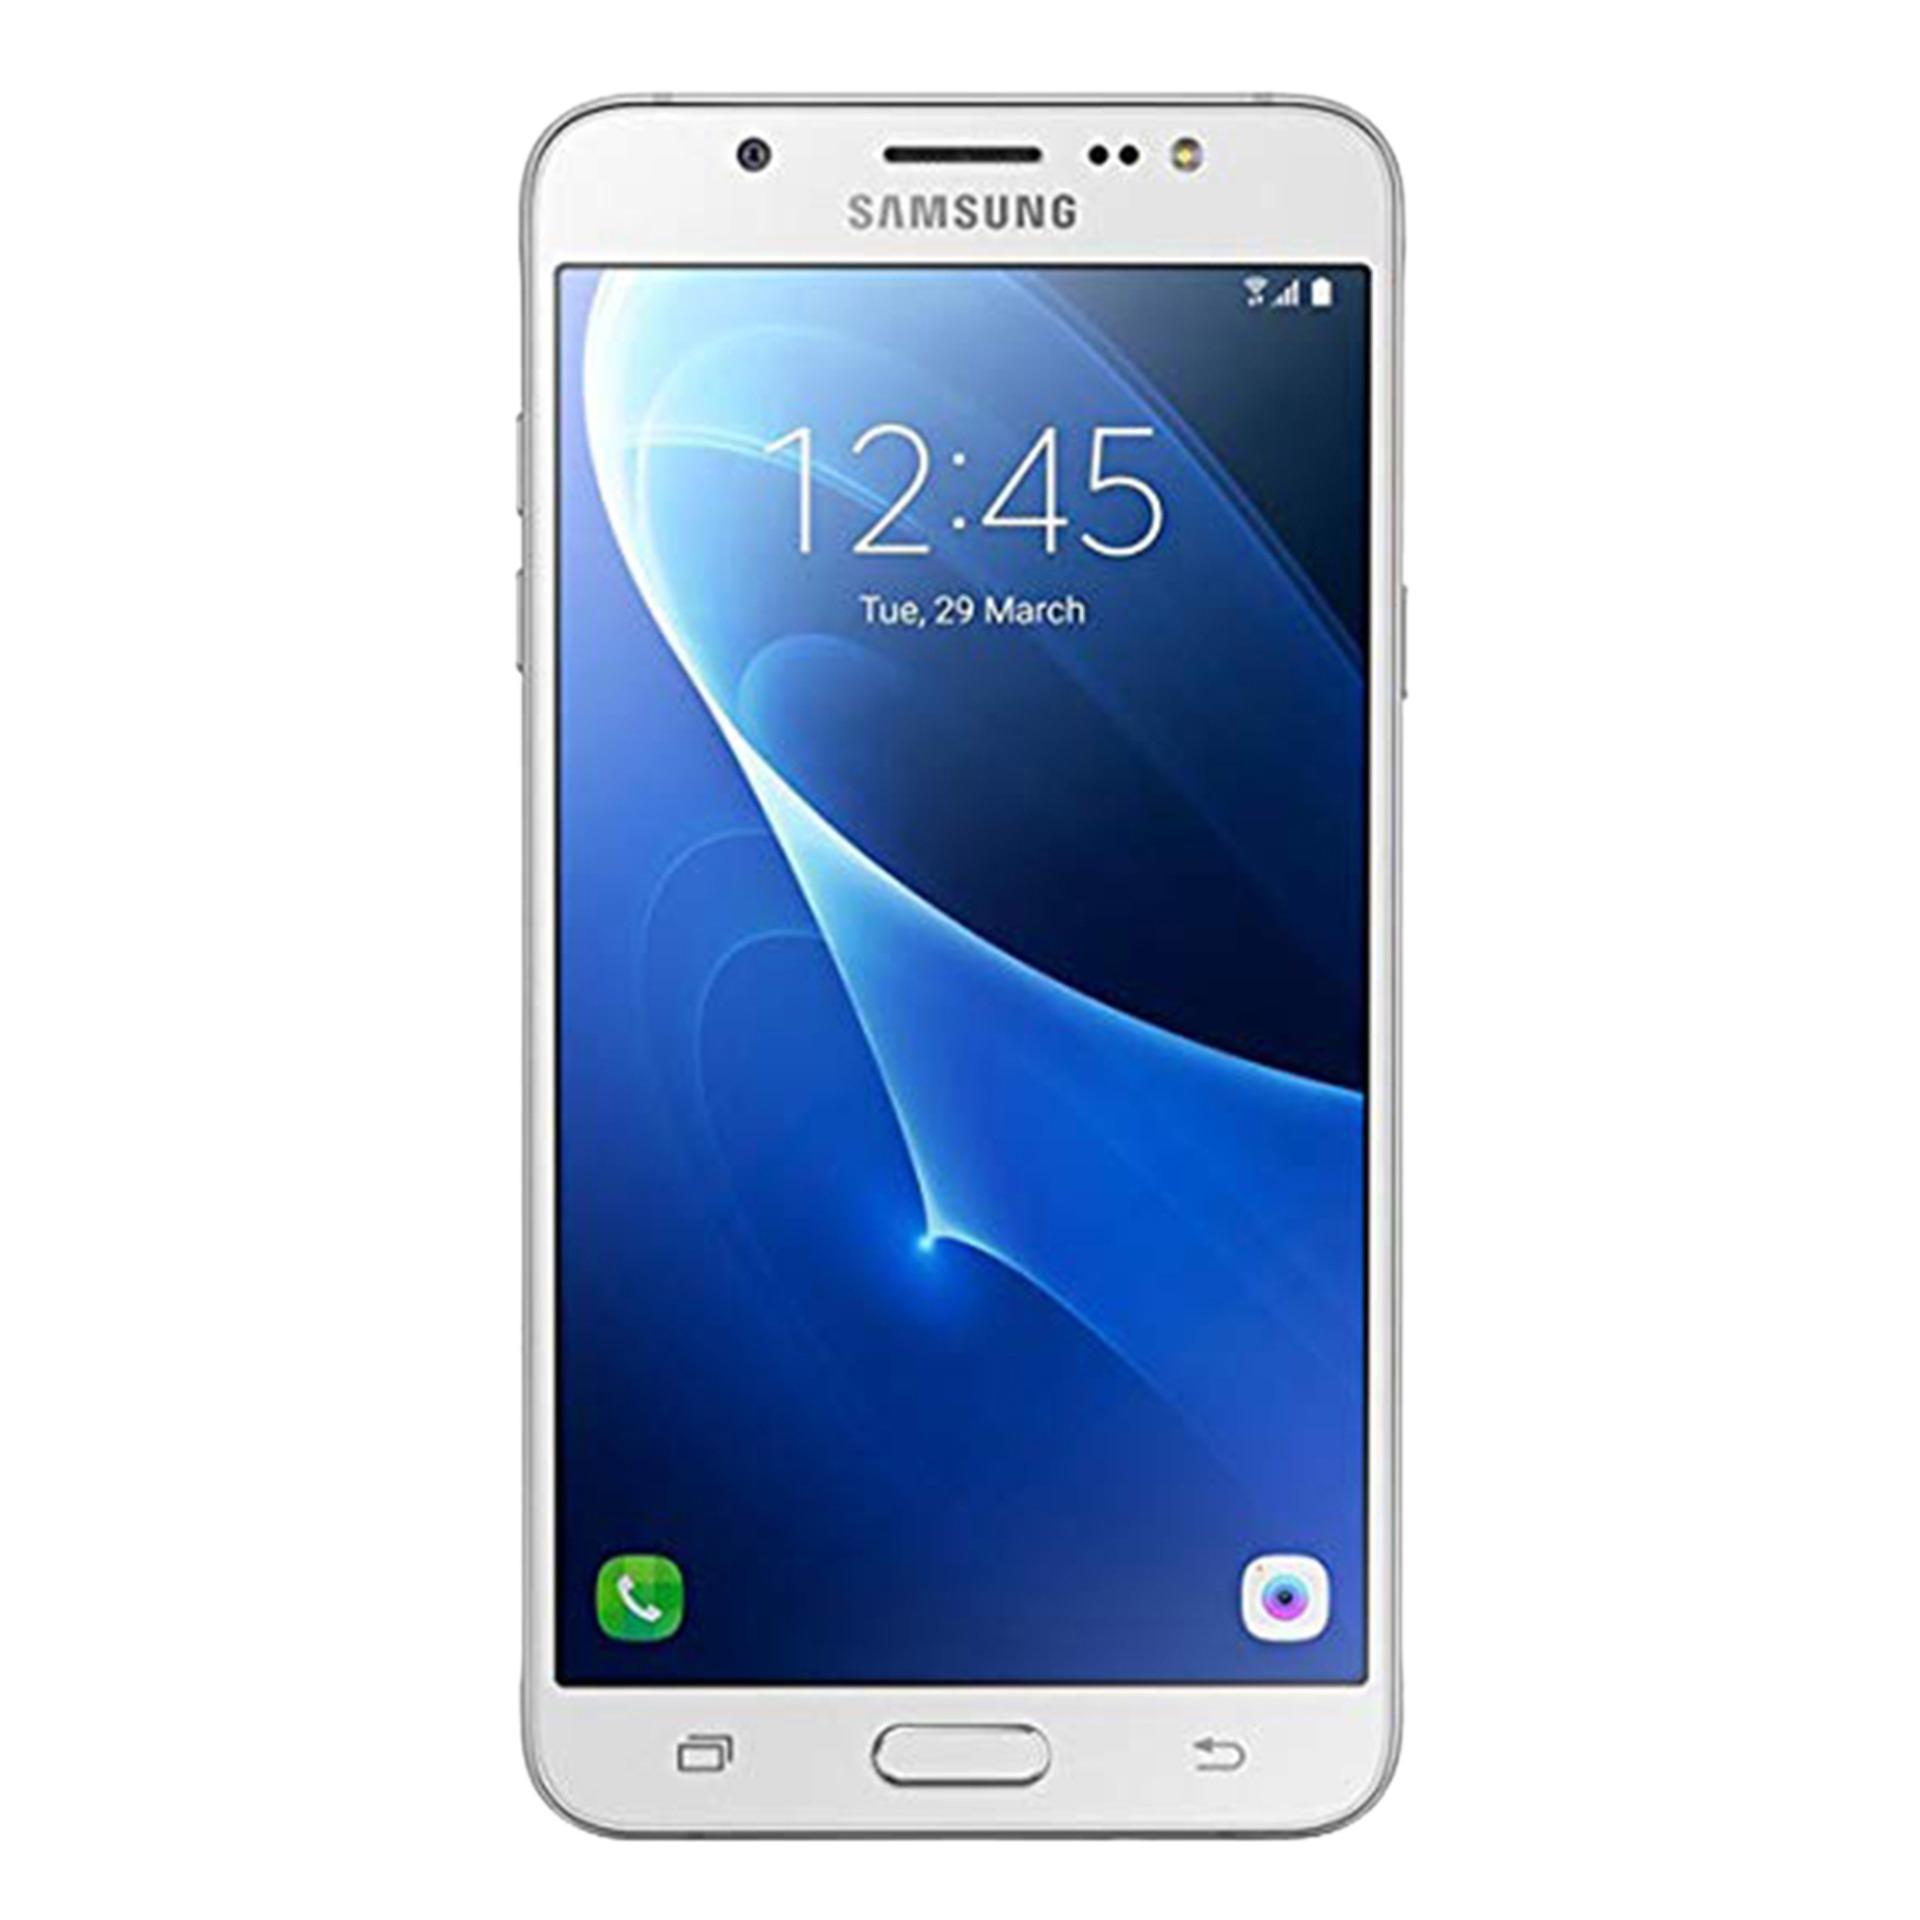 "Samsung Galaxy J7 2016 Smartphone 5 5"" 2GB RAM – 16GB ROM – White"